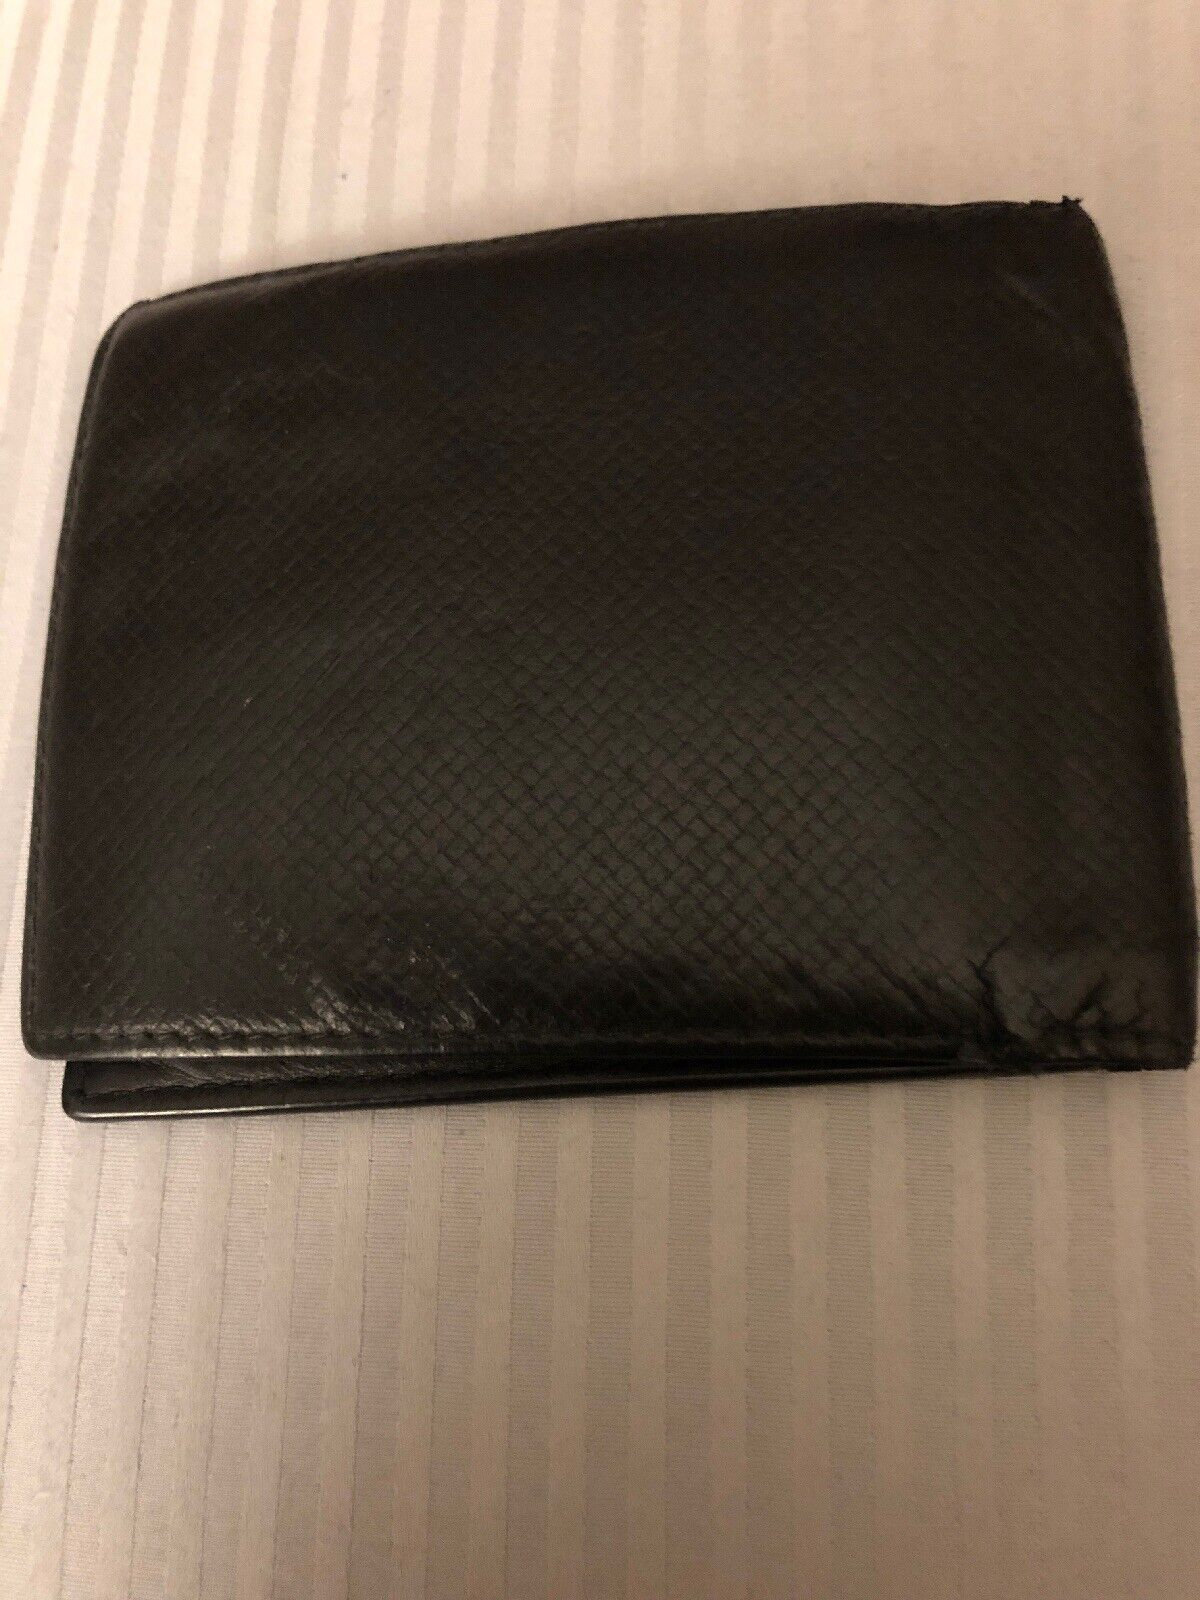 Montblanc Black Leather Men's Bi-Fold Wallet